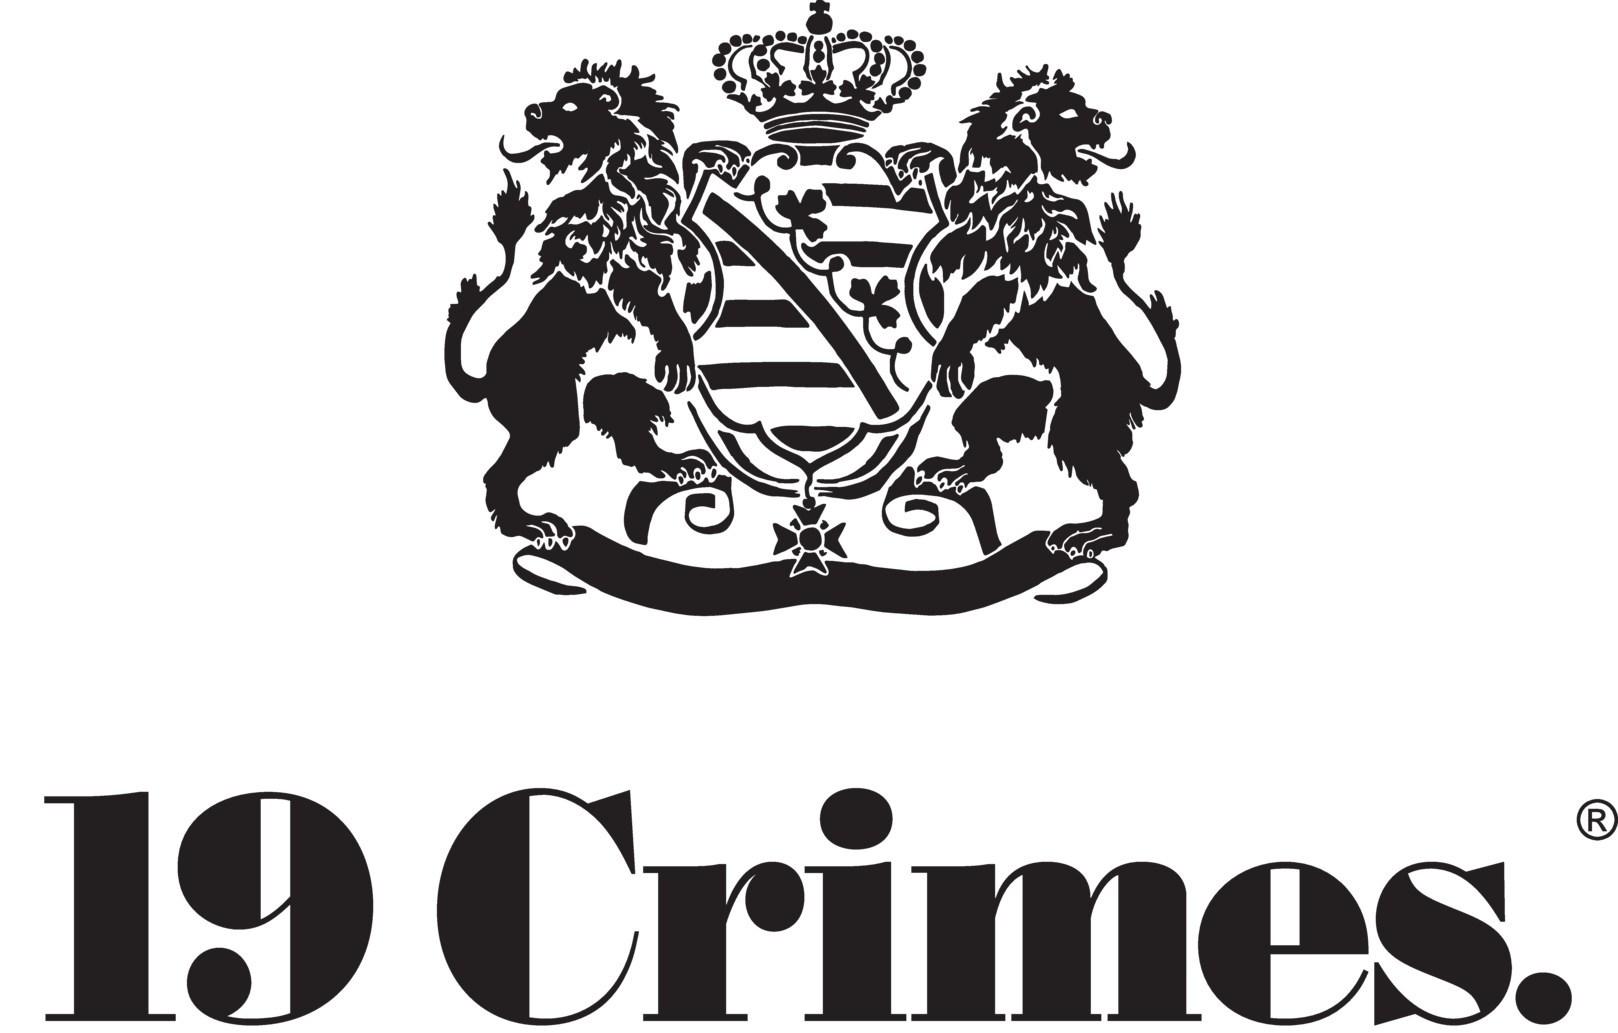 19CRIMES-Lockup-Primary